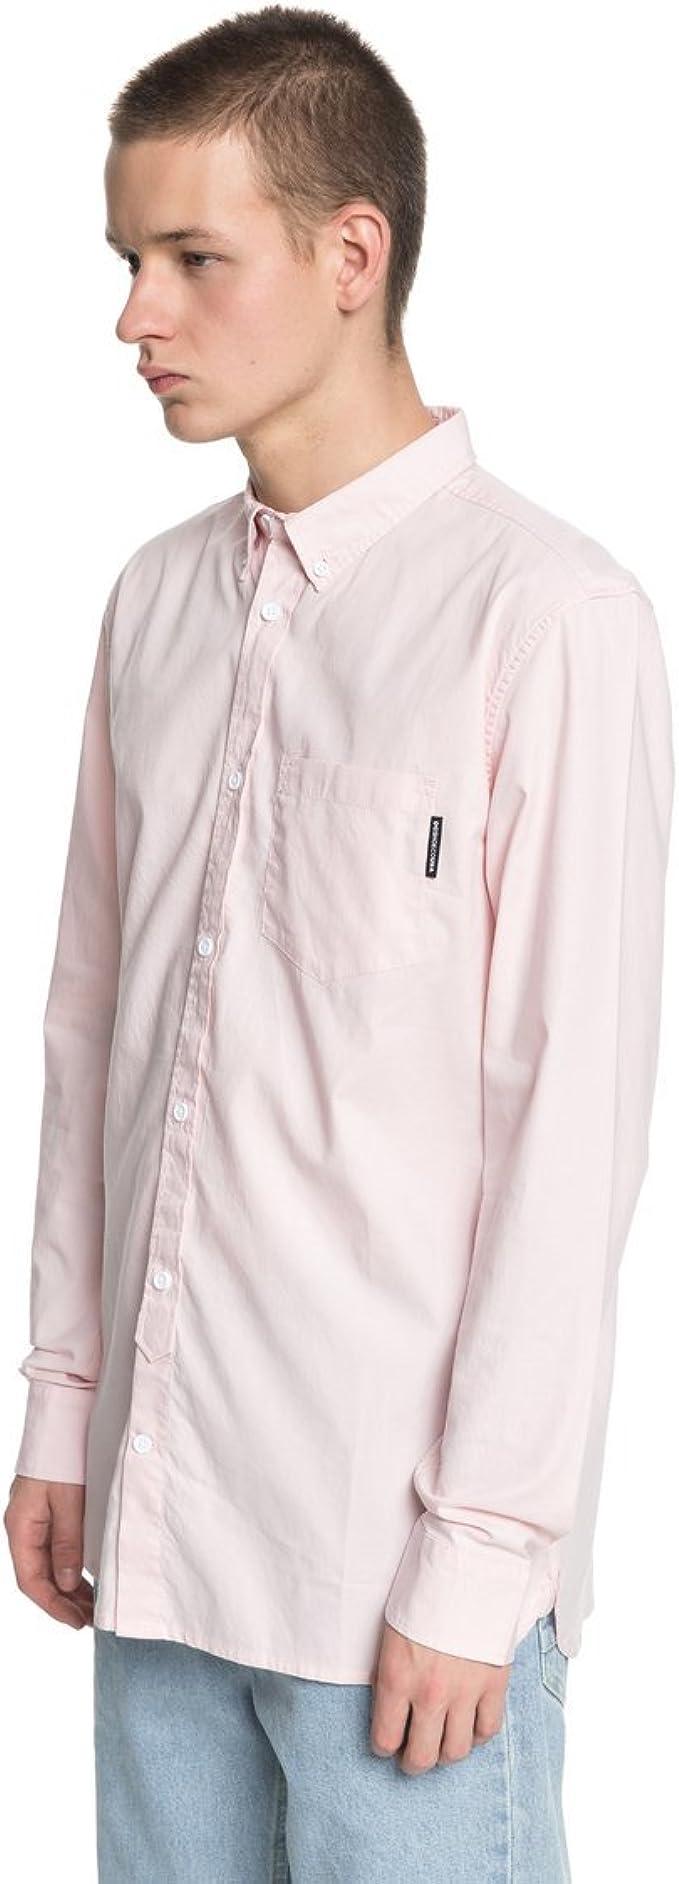 DC Shoes Classic Oxford Light - Camisa de Manga Larga para Hombre EDYWT03183: Amazon.es: Ropa y accesorios